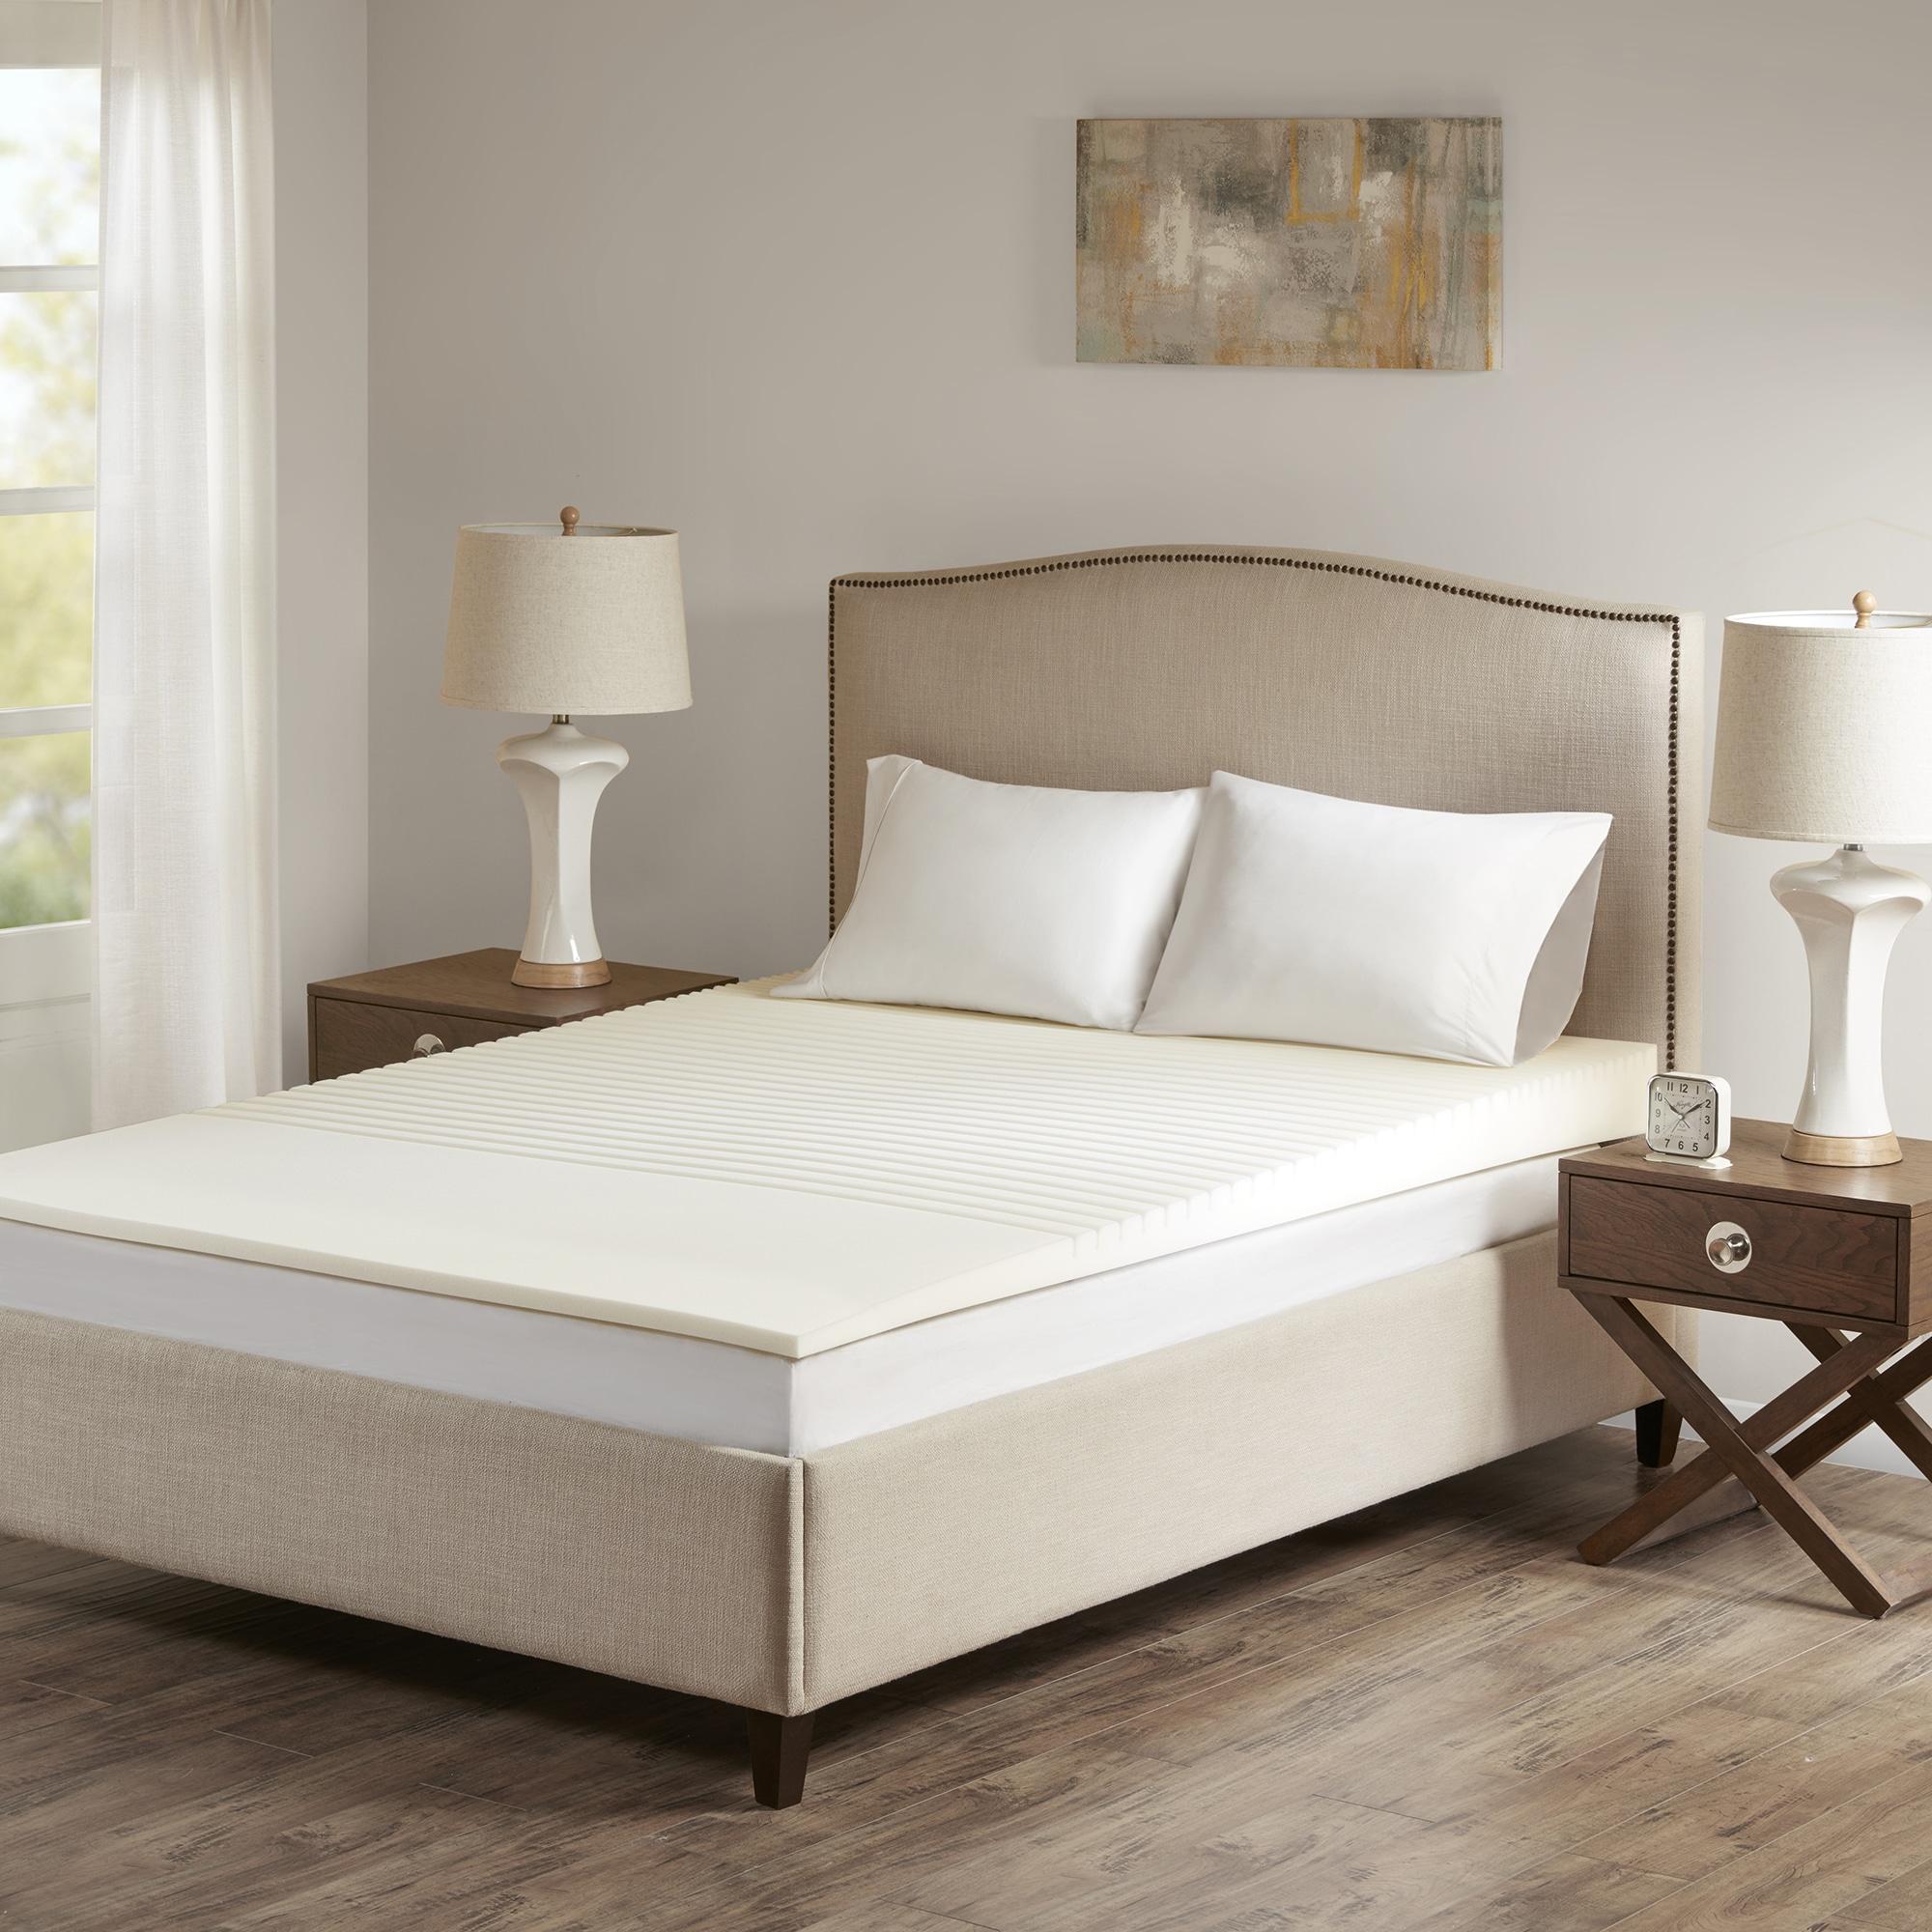 Shop Flexapedic by Sleep Philosophy Wedge Inclined Foam Entire Bed ...